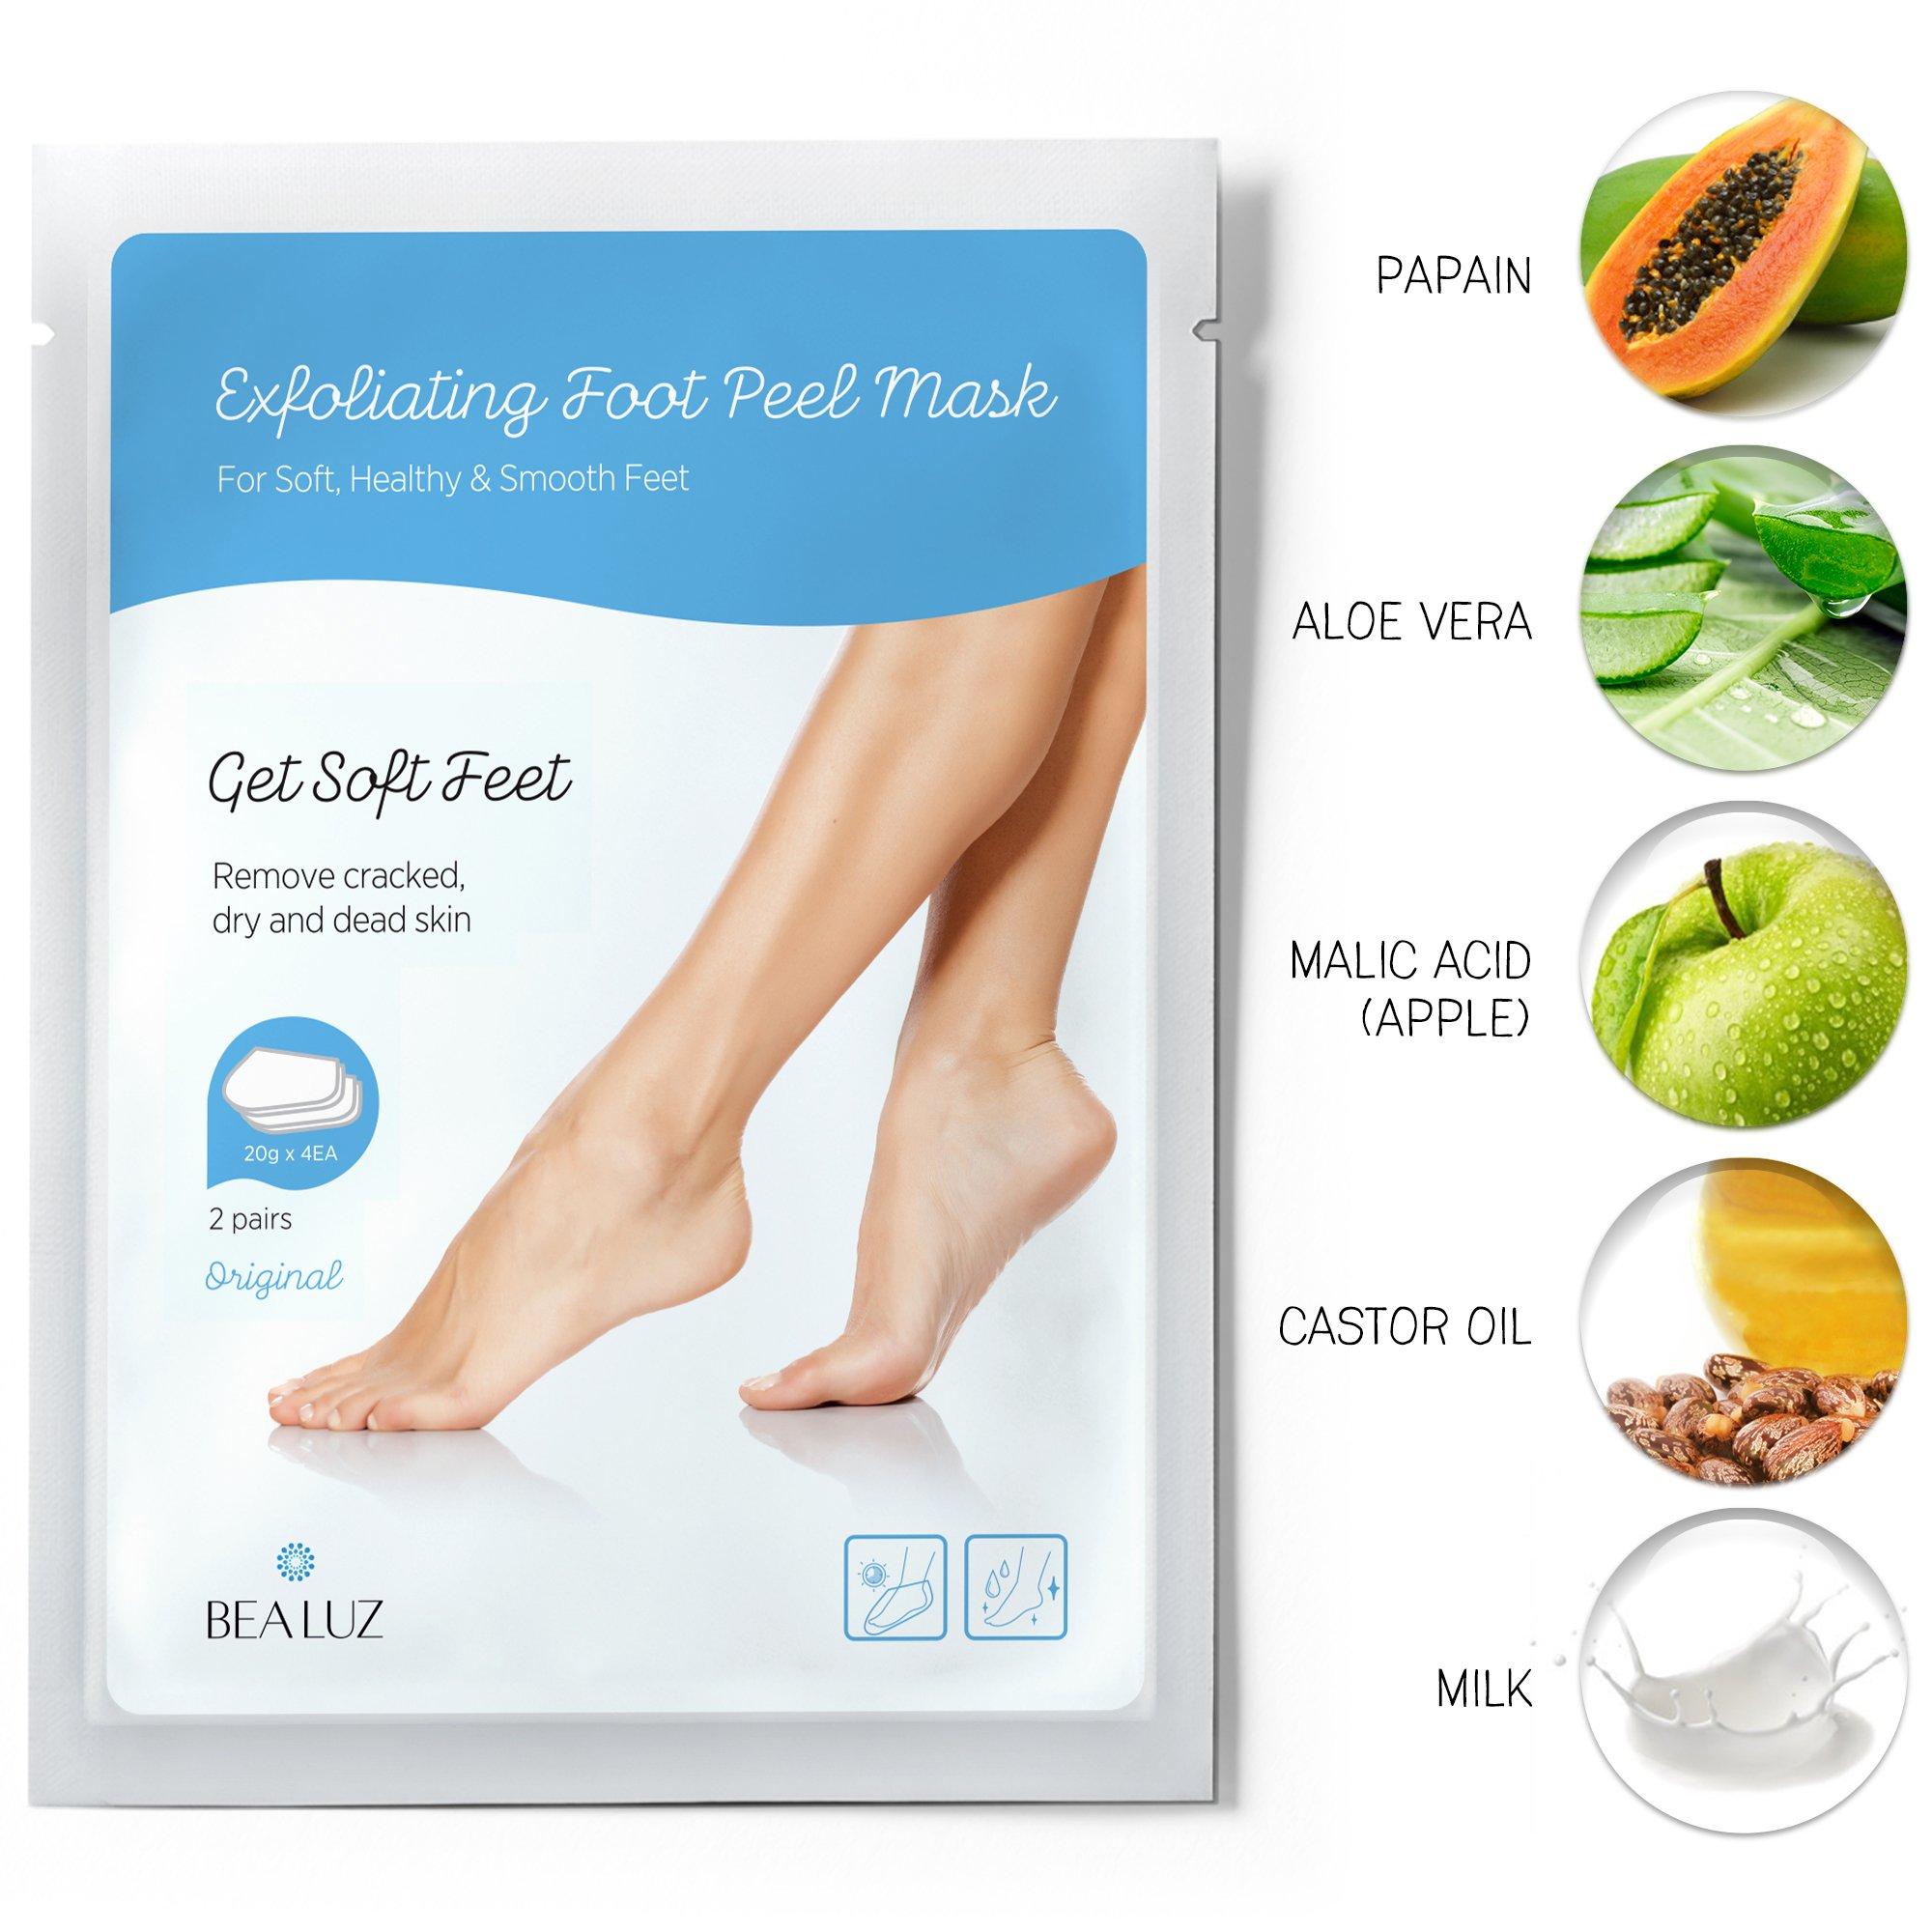 2 Pairs Exfoliating Foot Peel Mask, Soft & Smooth Feet, Peeling Away Rough Dead Skin & Calluses in 1-2 Weeks, Repairing Exfoliant by BEALUZ (Image #3)